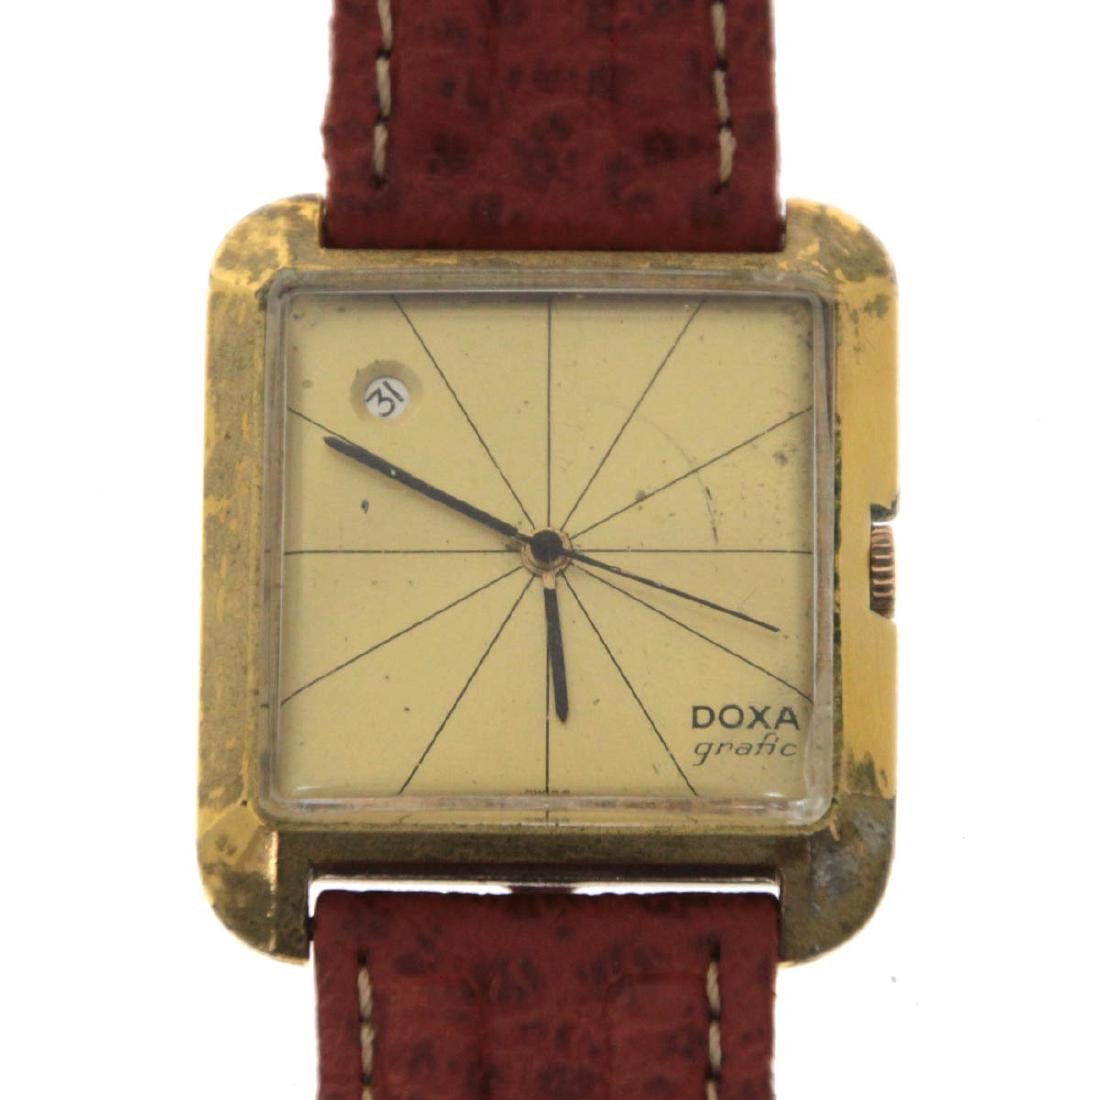 Doxa Grafic Wrist Watch.